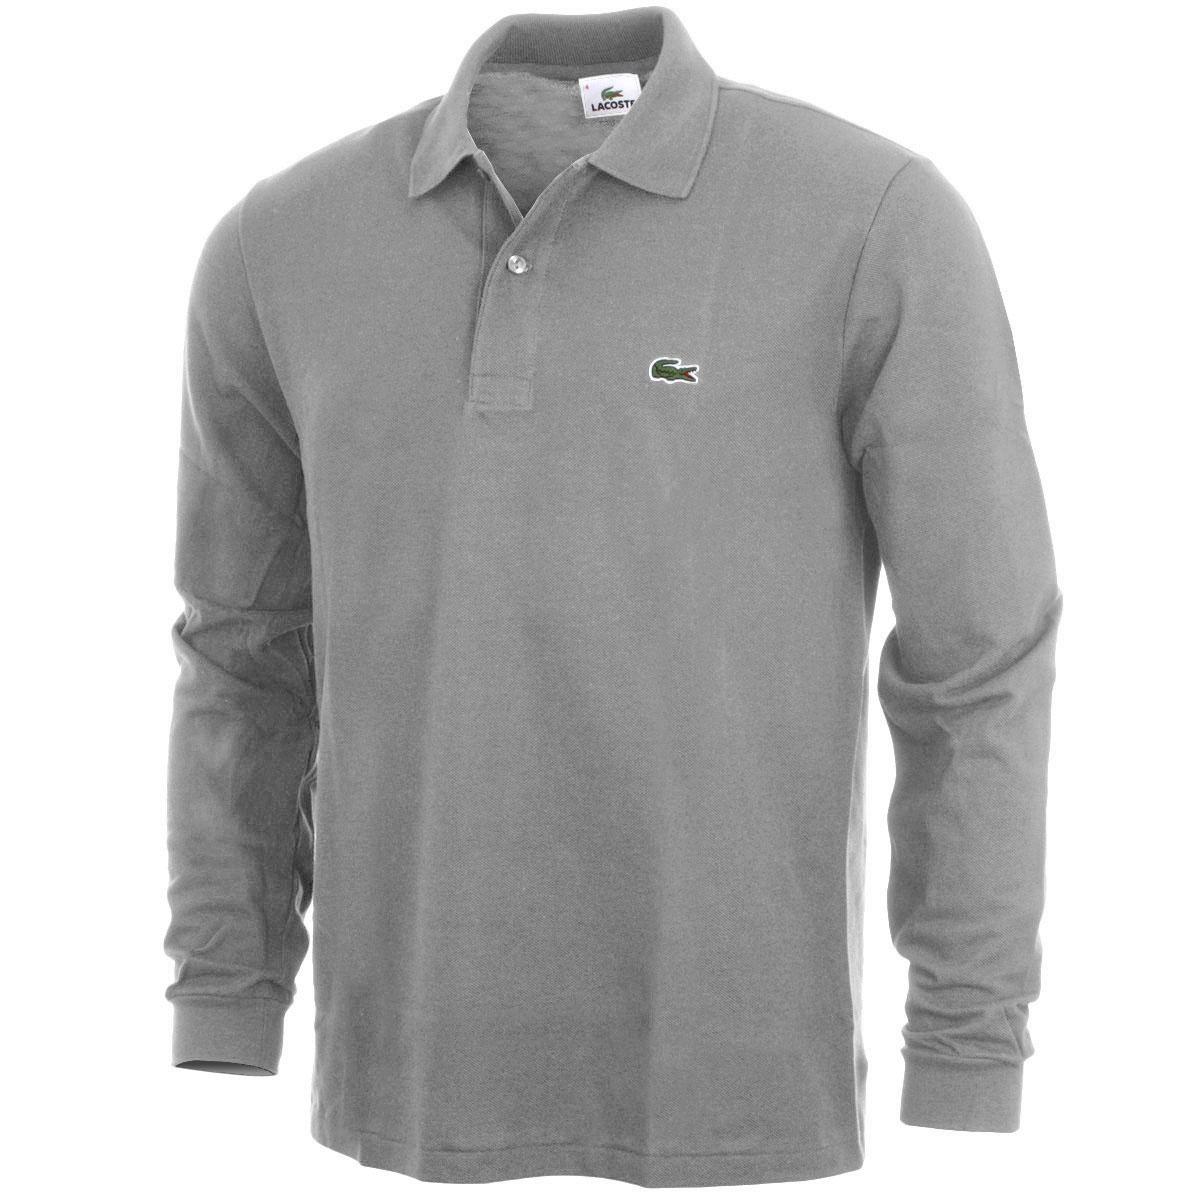 Black Lacoste Long Sleeve Shirt